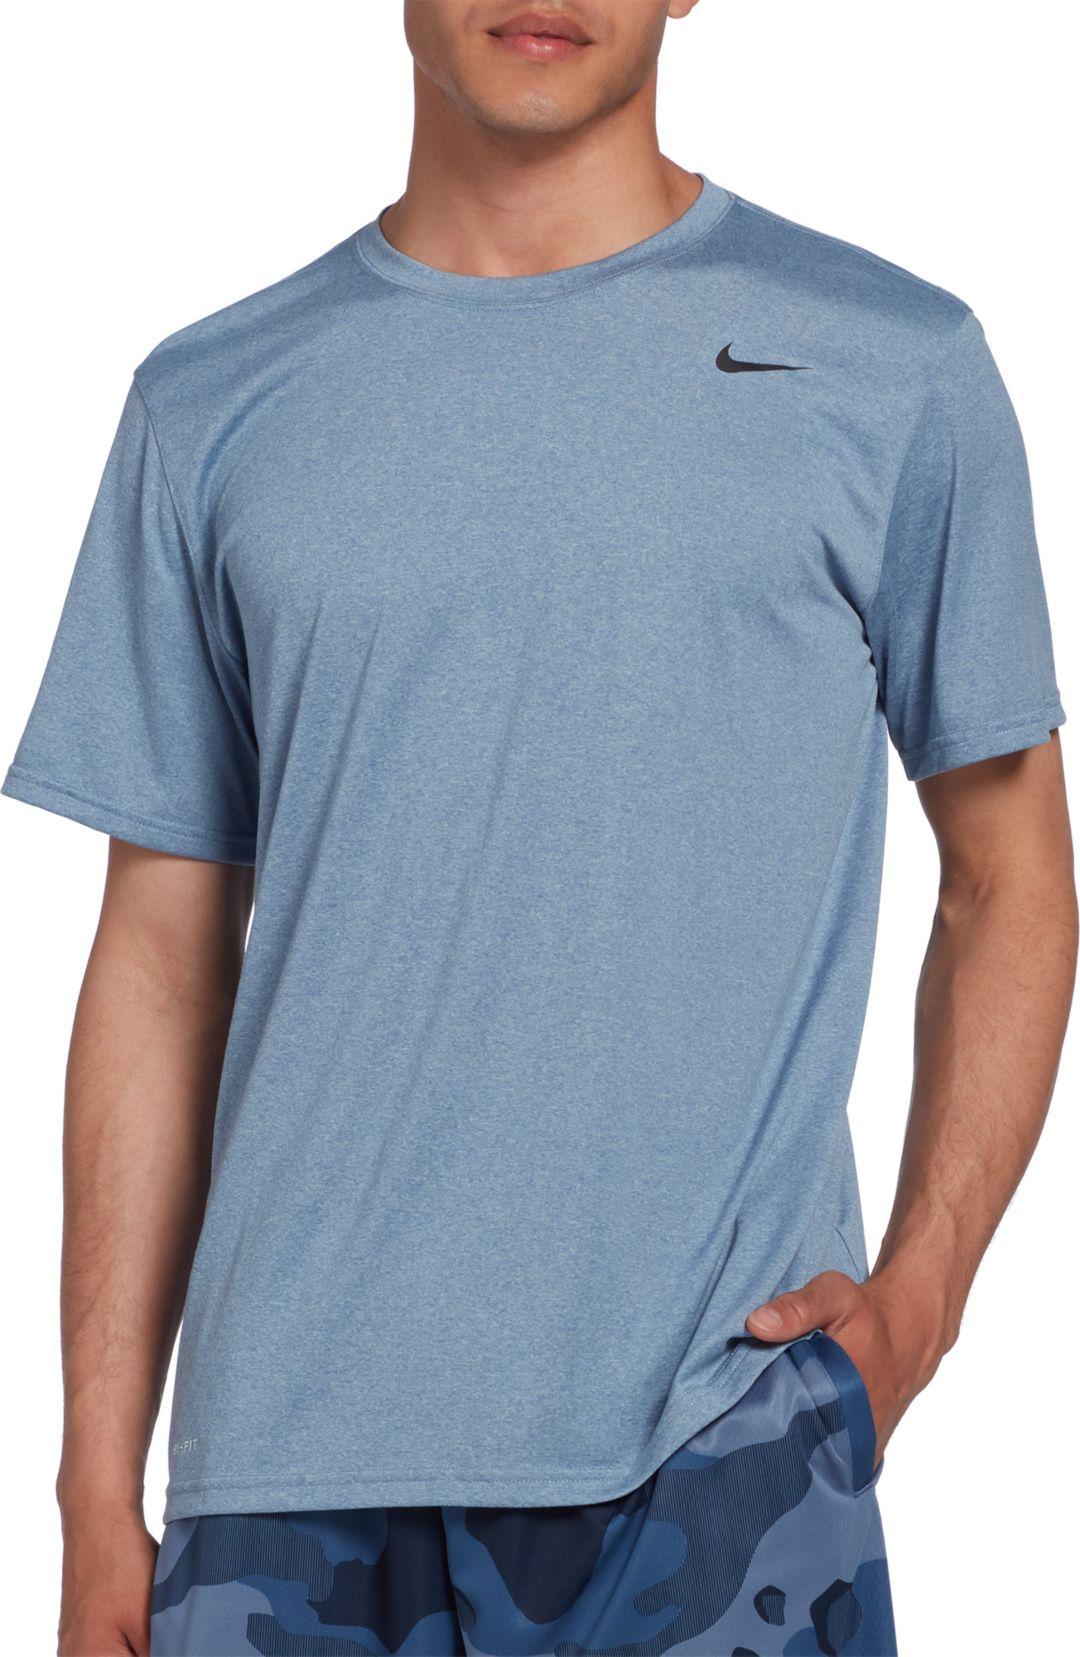 5d3e4af5330ec Nike Men's Legend 2.0 T-Shirt | DICK'S Sporting Goods